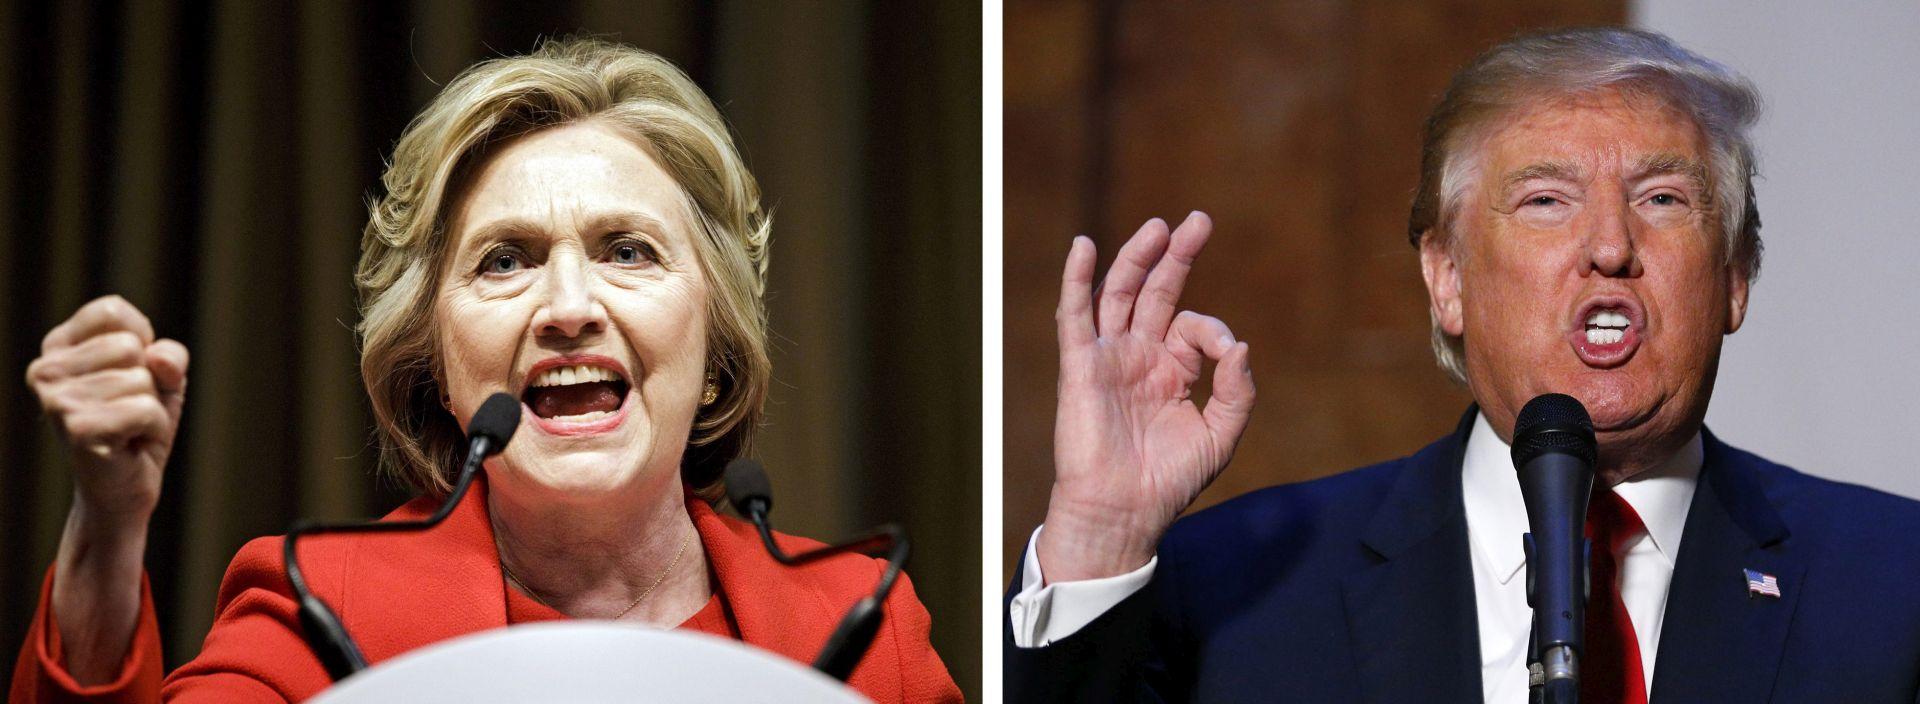 PRVE ANKETE: Clinton znatno vodi ispred Trumpa nakon konvencija